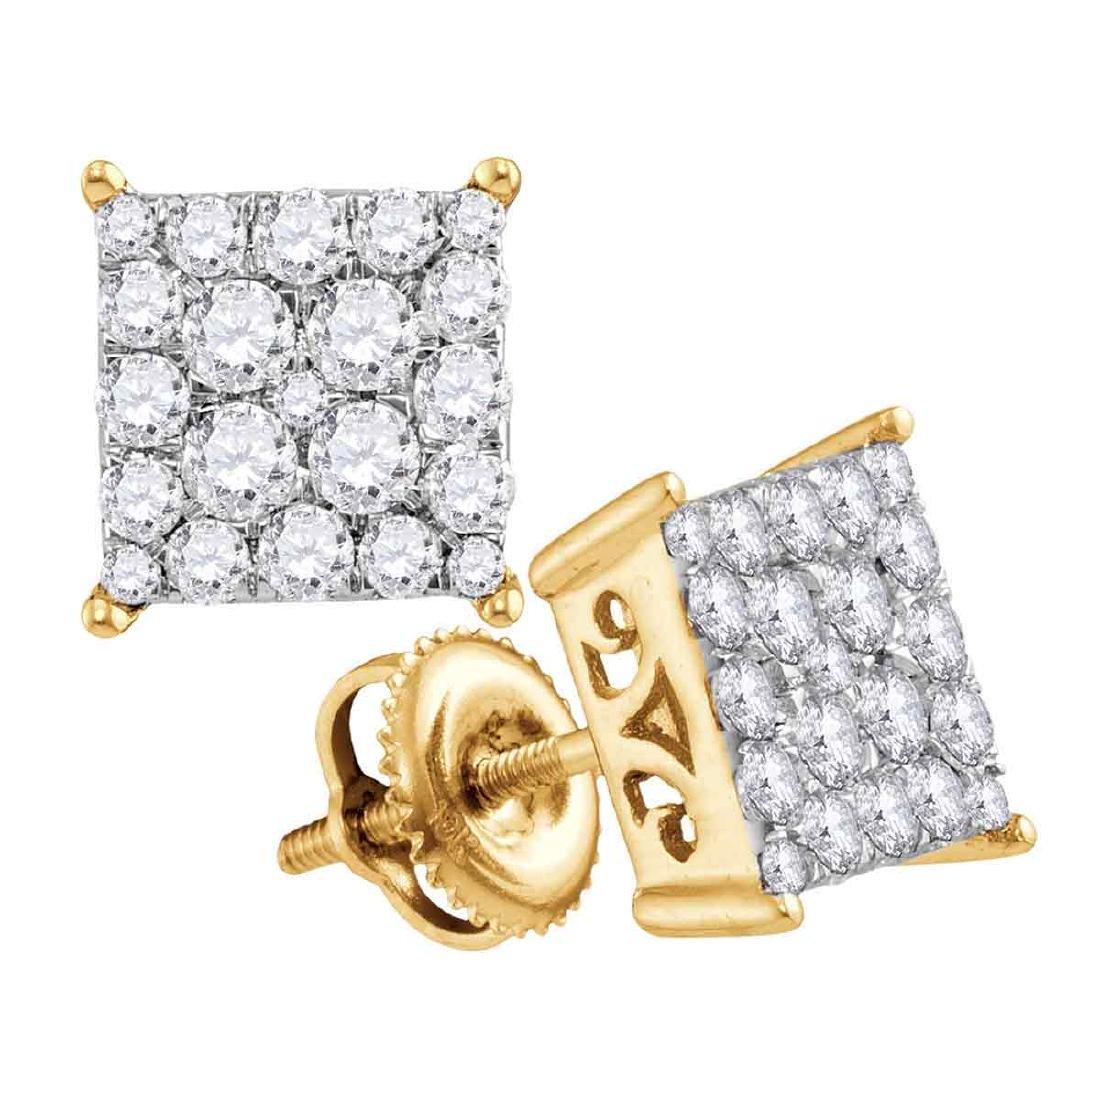 0.95 CTW Diamond Square Cluster Stud Earrings 10KT